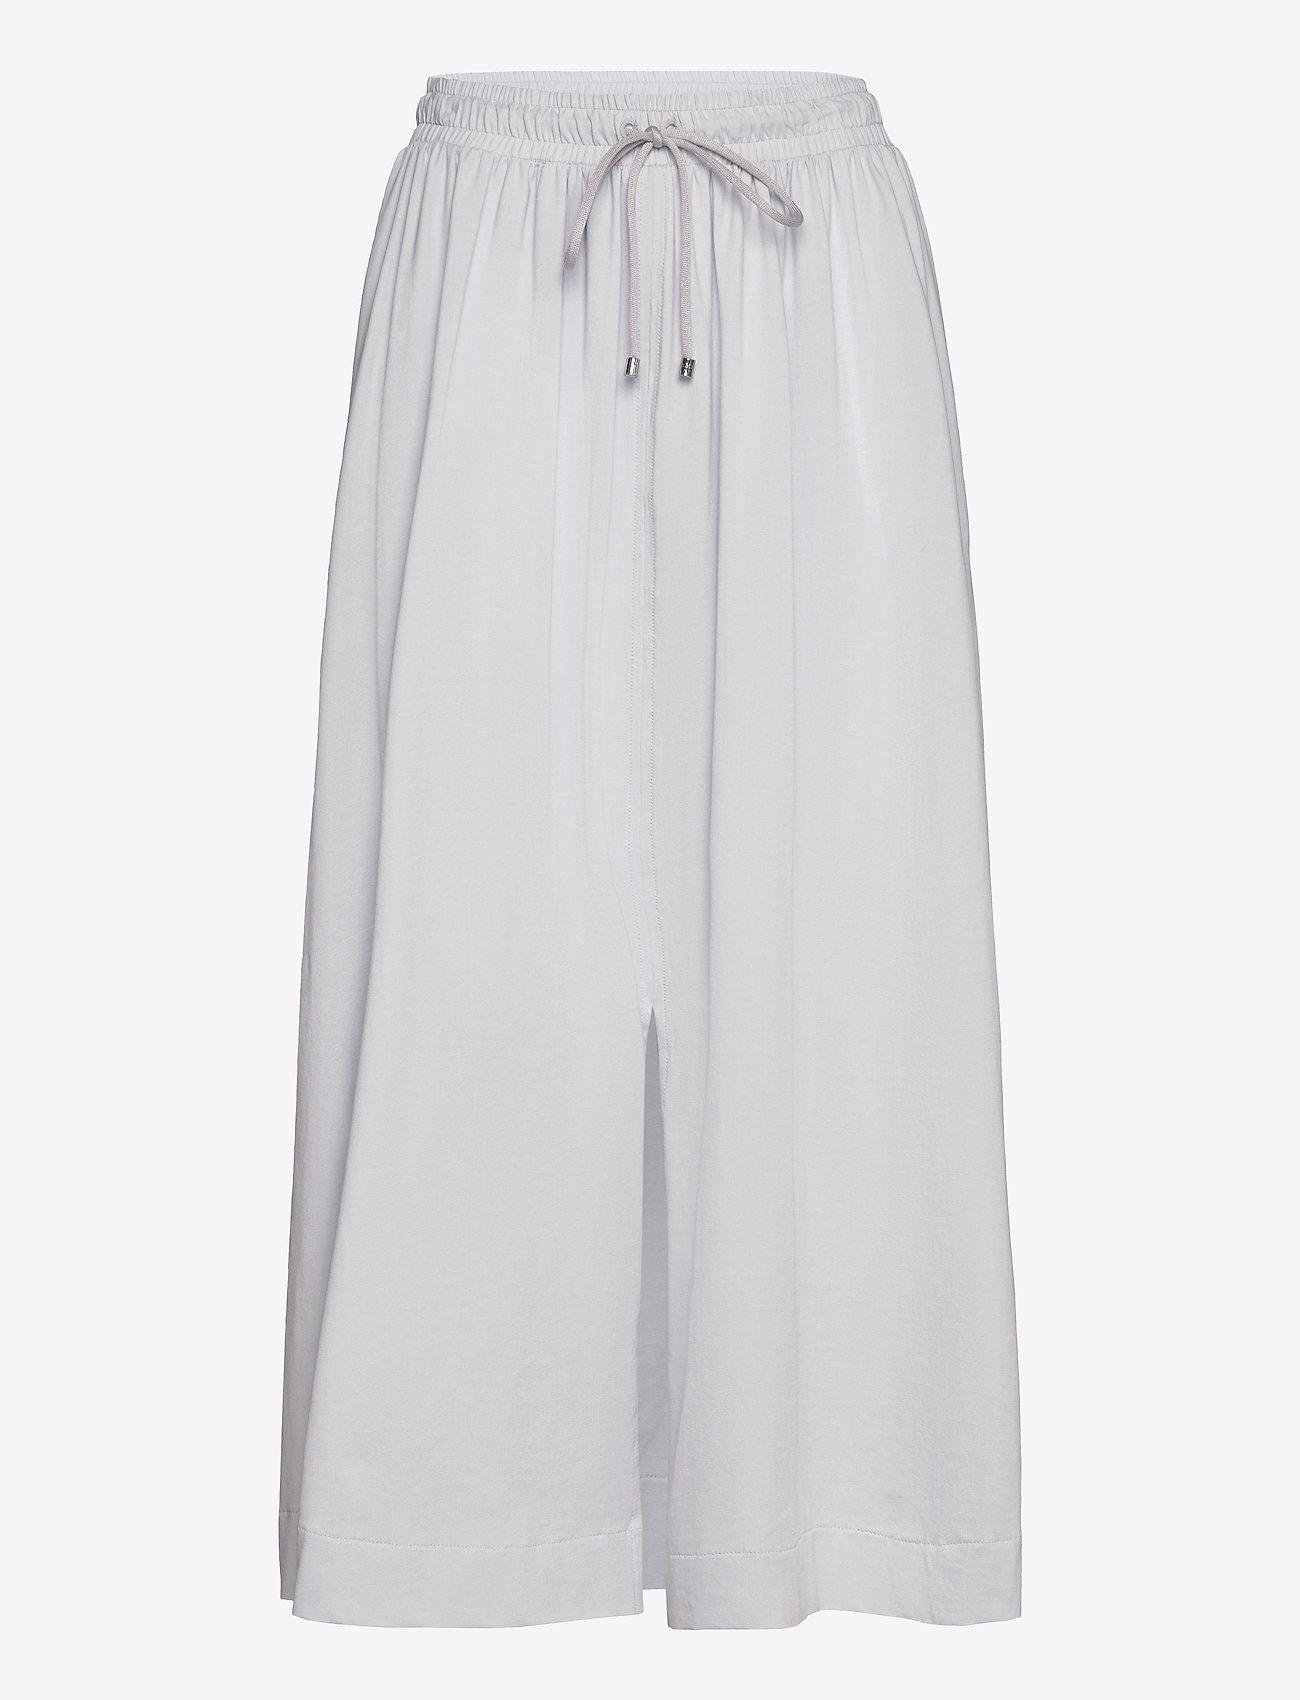 Max Mara Leisure - RADAR - midi skirts - light grey - 0